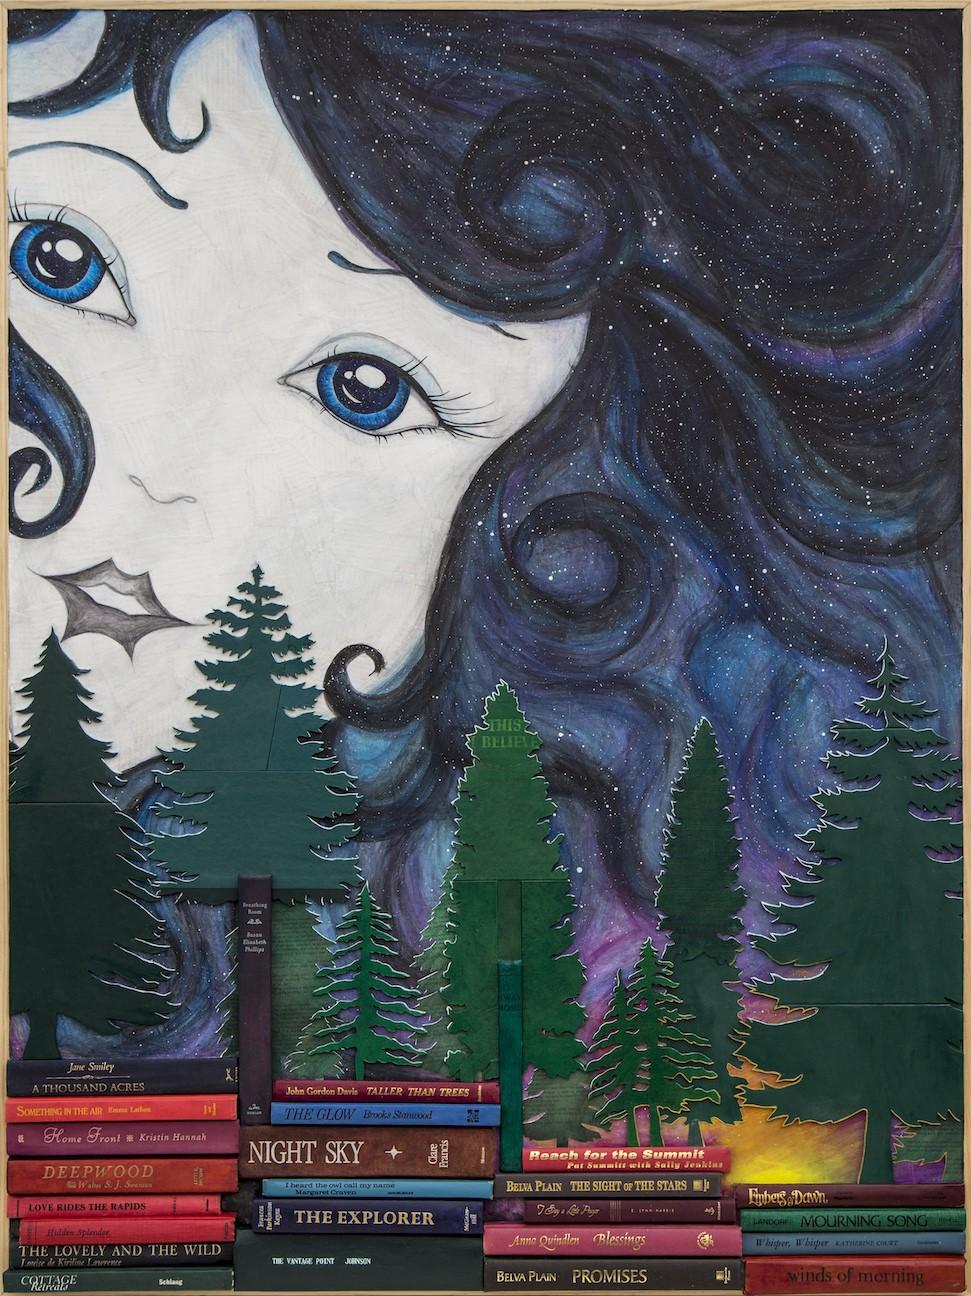 baerwald_i_see_the_moon_the_moon_sees_me_acrylic_on_books.jpg